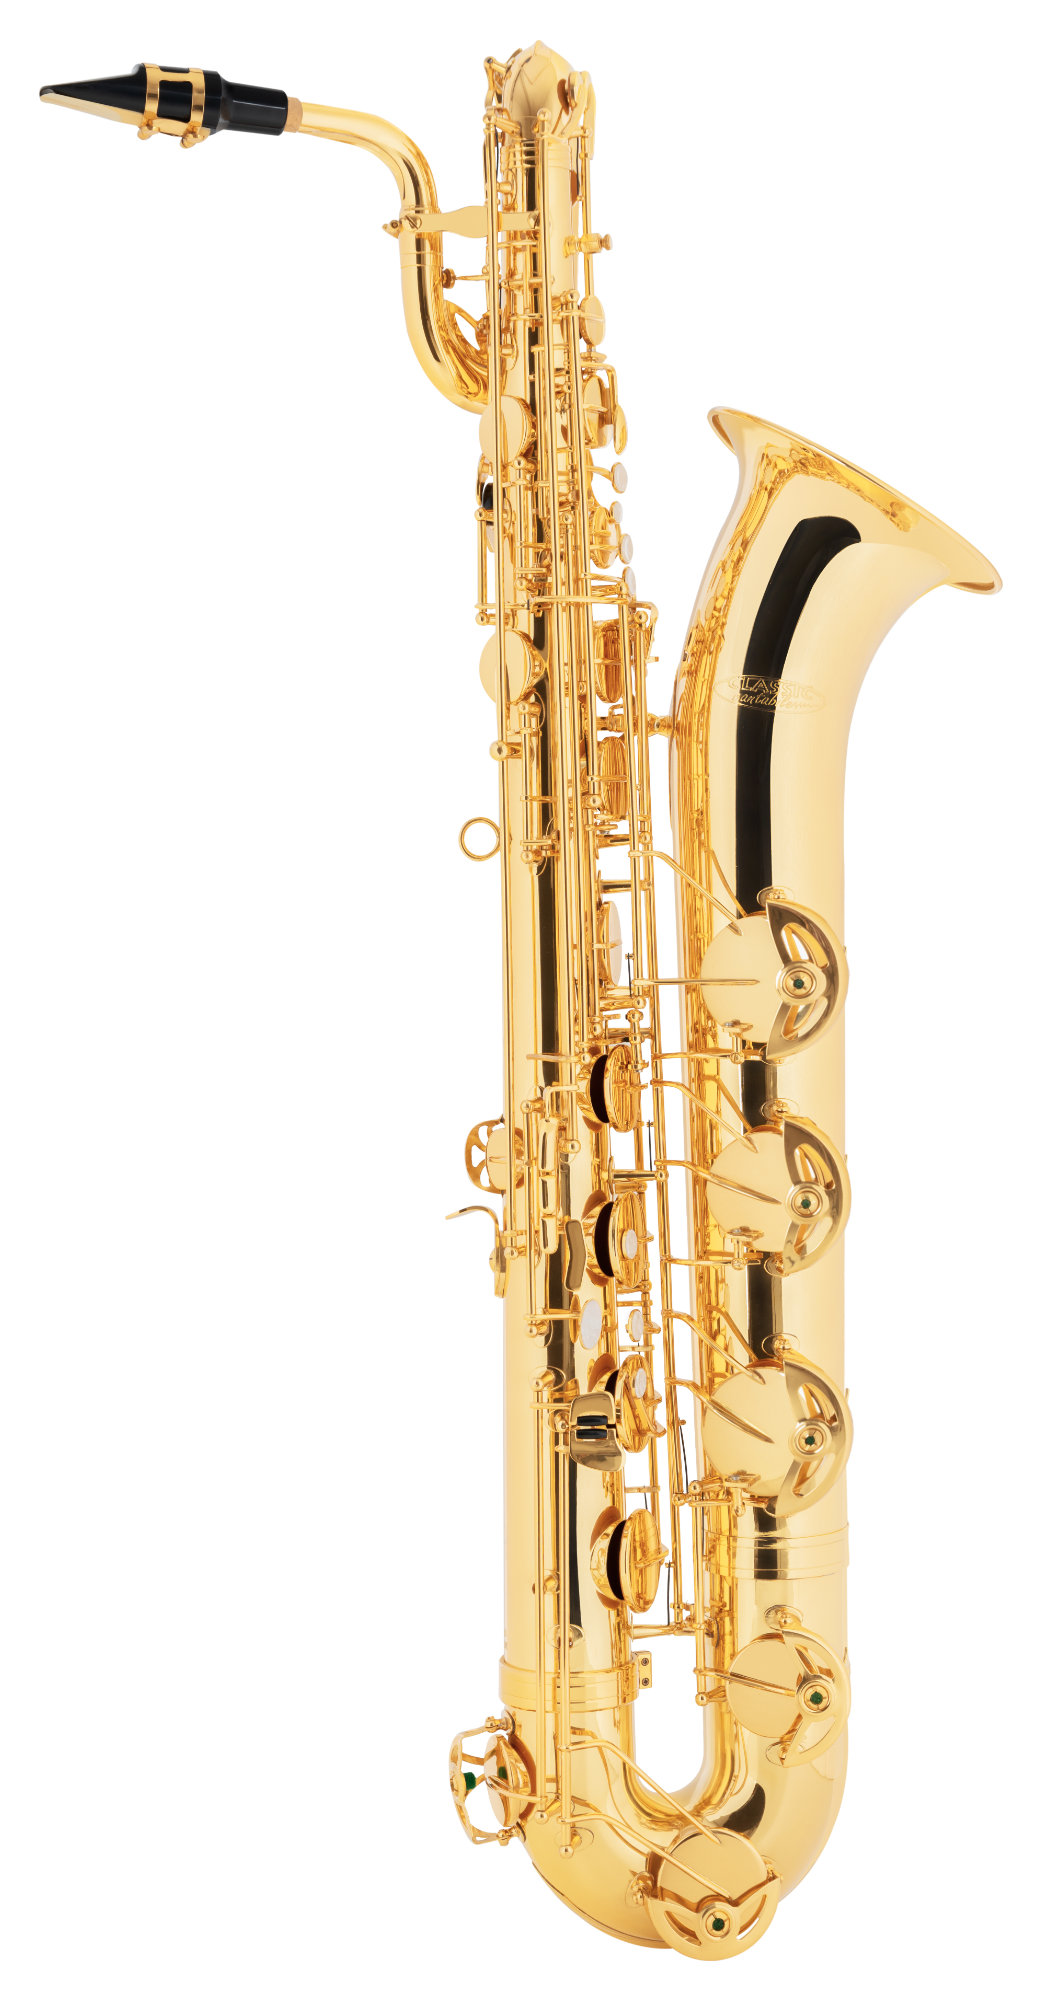 Saxophone - Classic Cantabile BS 460 Baritonsaxophon - Onlineshop Musikhaus Kirstein